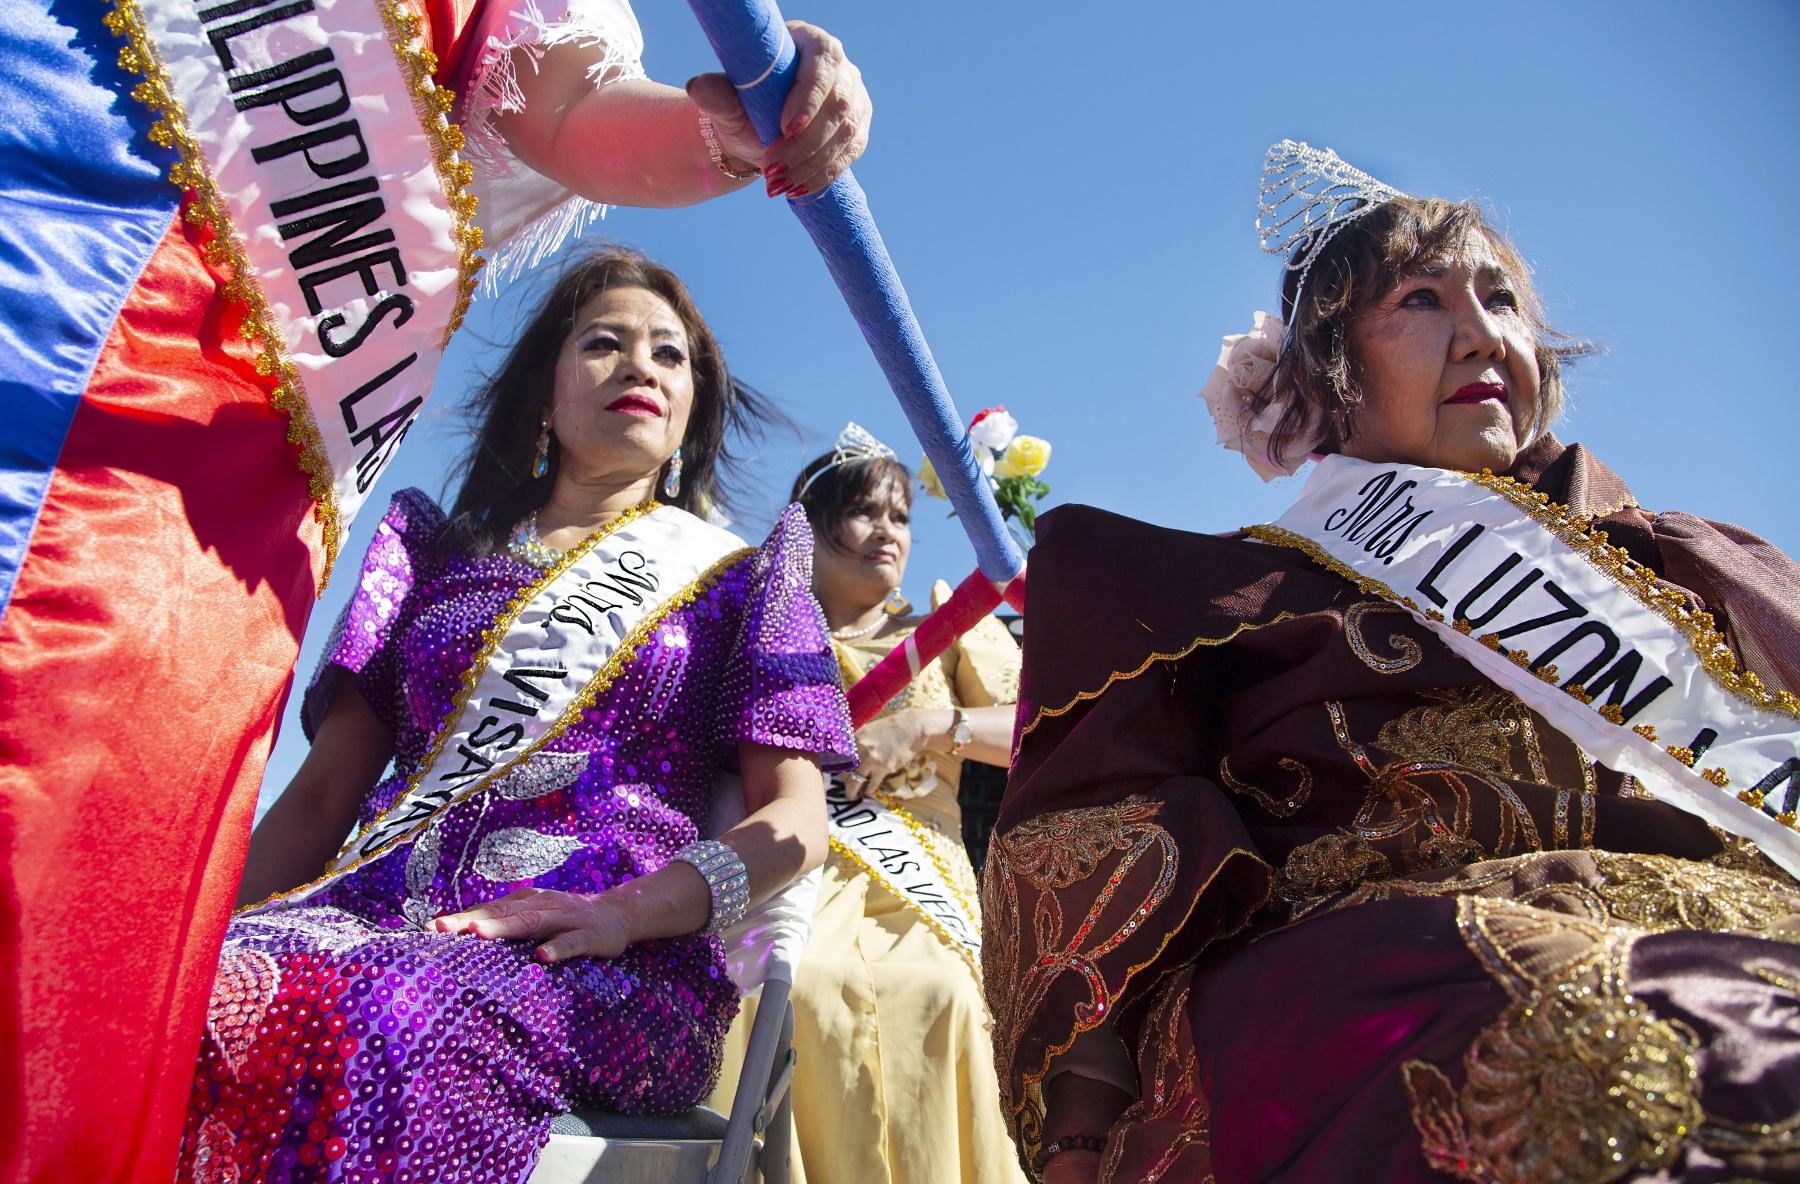 Hermia Landy, right, Vivian Locke, center, and Padua Raman, left, wait before the parade celebrating the 121st  Filipino Independence Day. Las Vegas. Sunday, June 9, 2019.